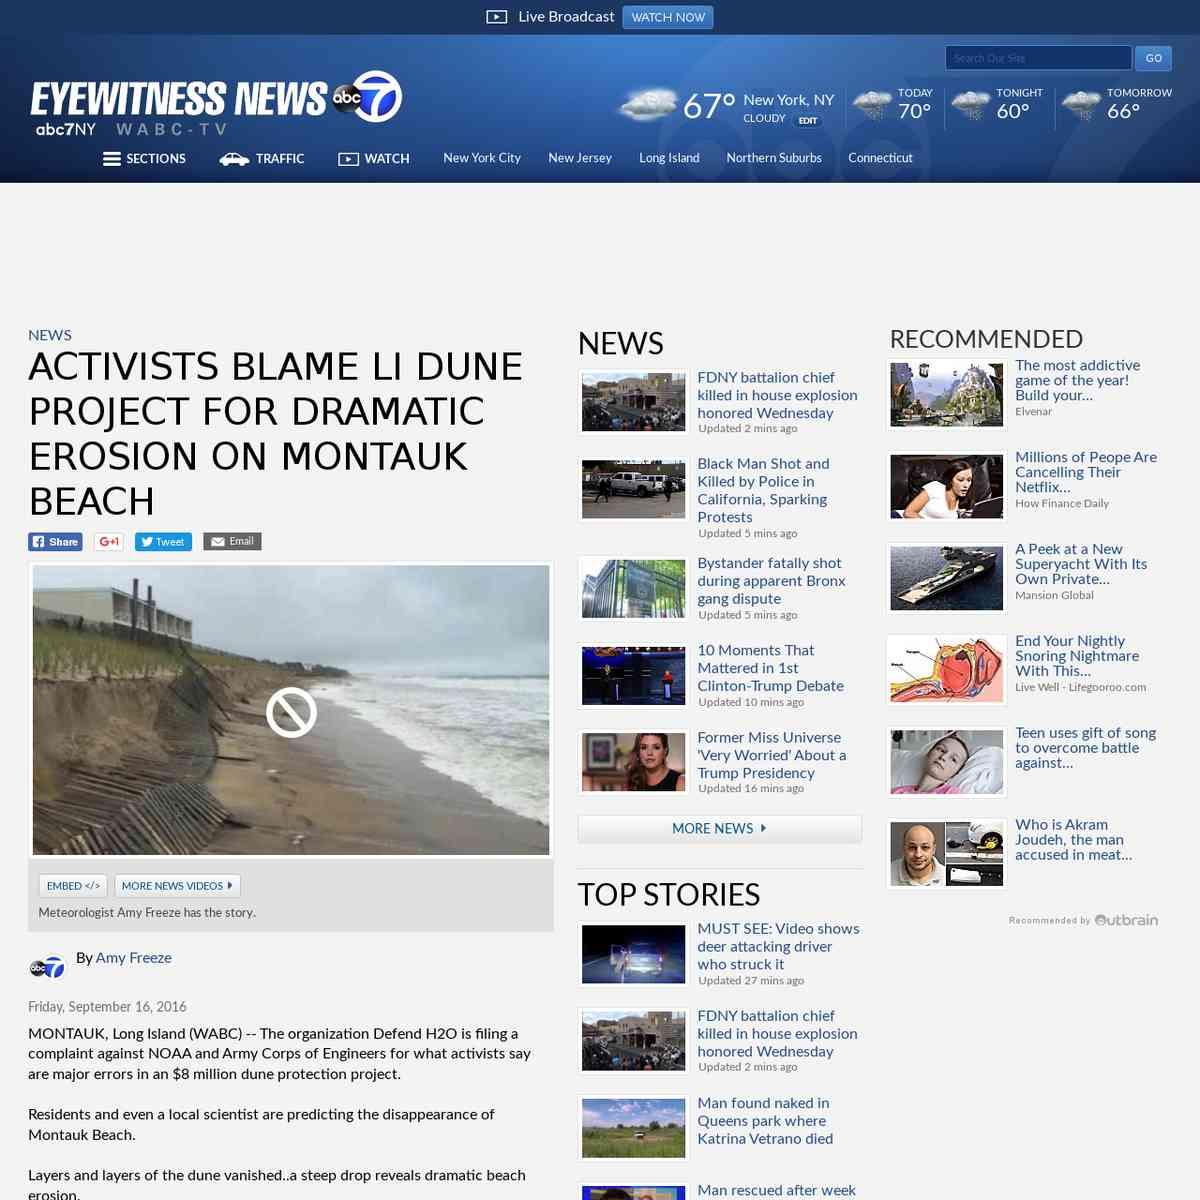 ACTIVISTS BLAME LI DUNE PROJECT FOR DRAMATIC EROSION ON MONTAUK BEACH